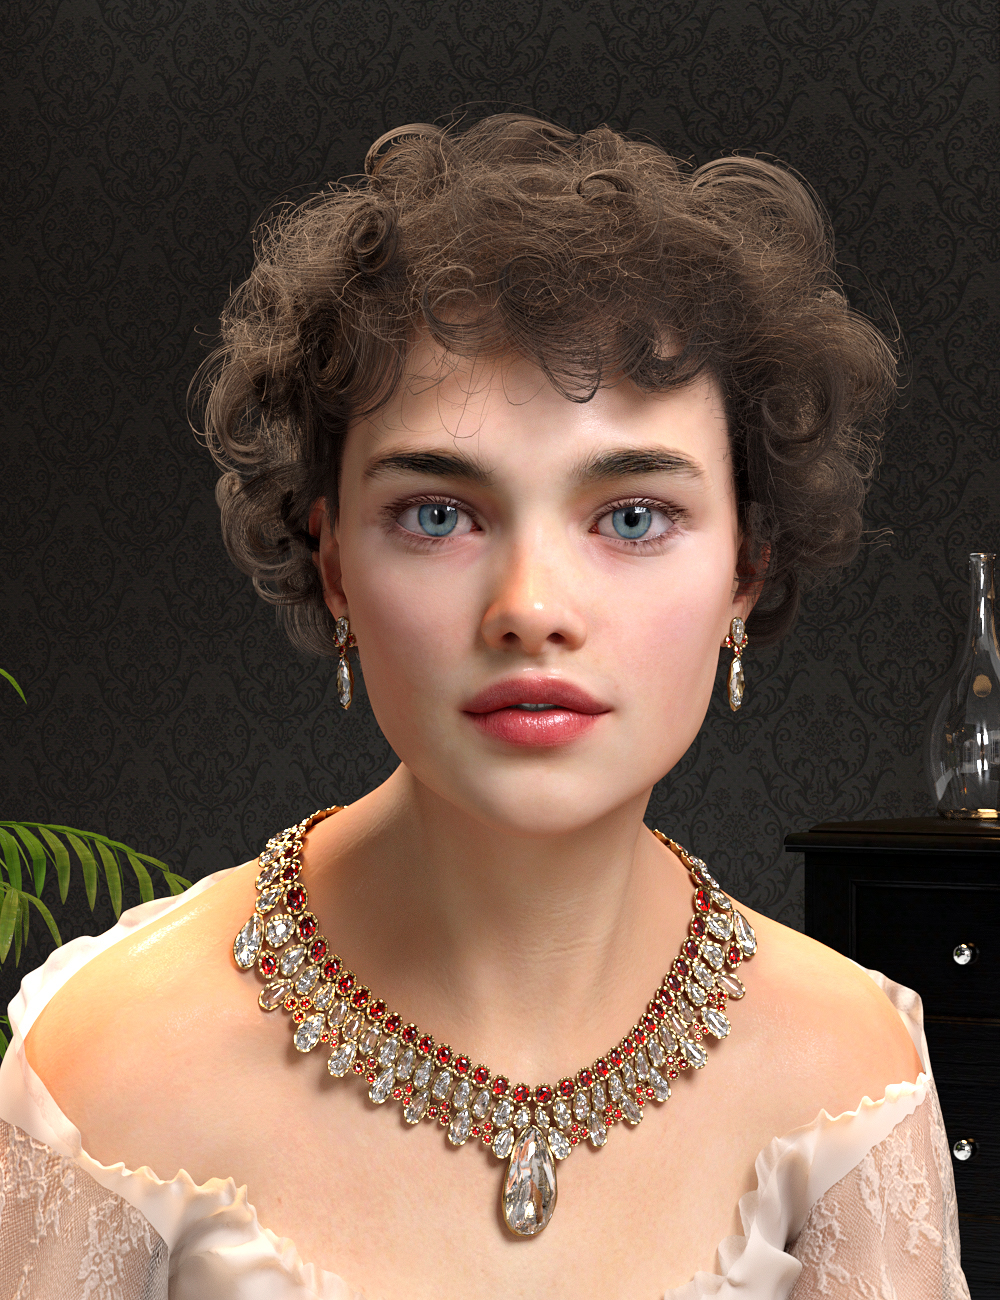 Nikolina for Genesis 8 Female by: Virtual_World, 3D Models by Daz 3D